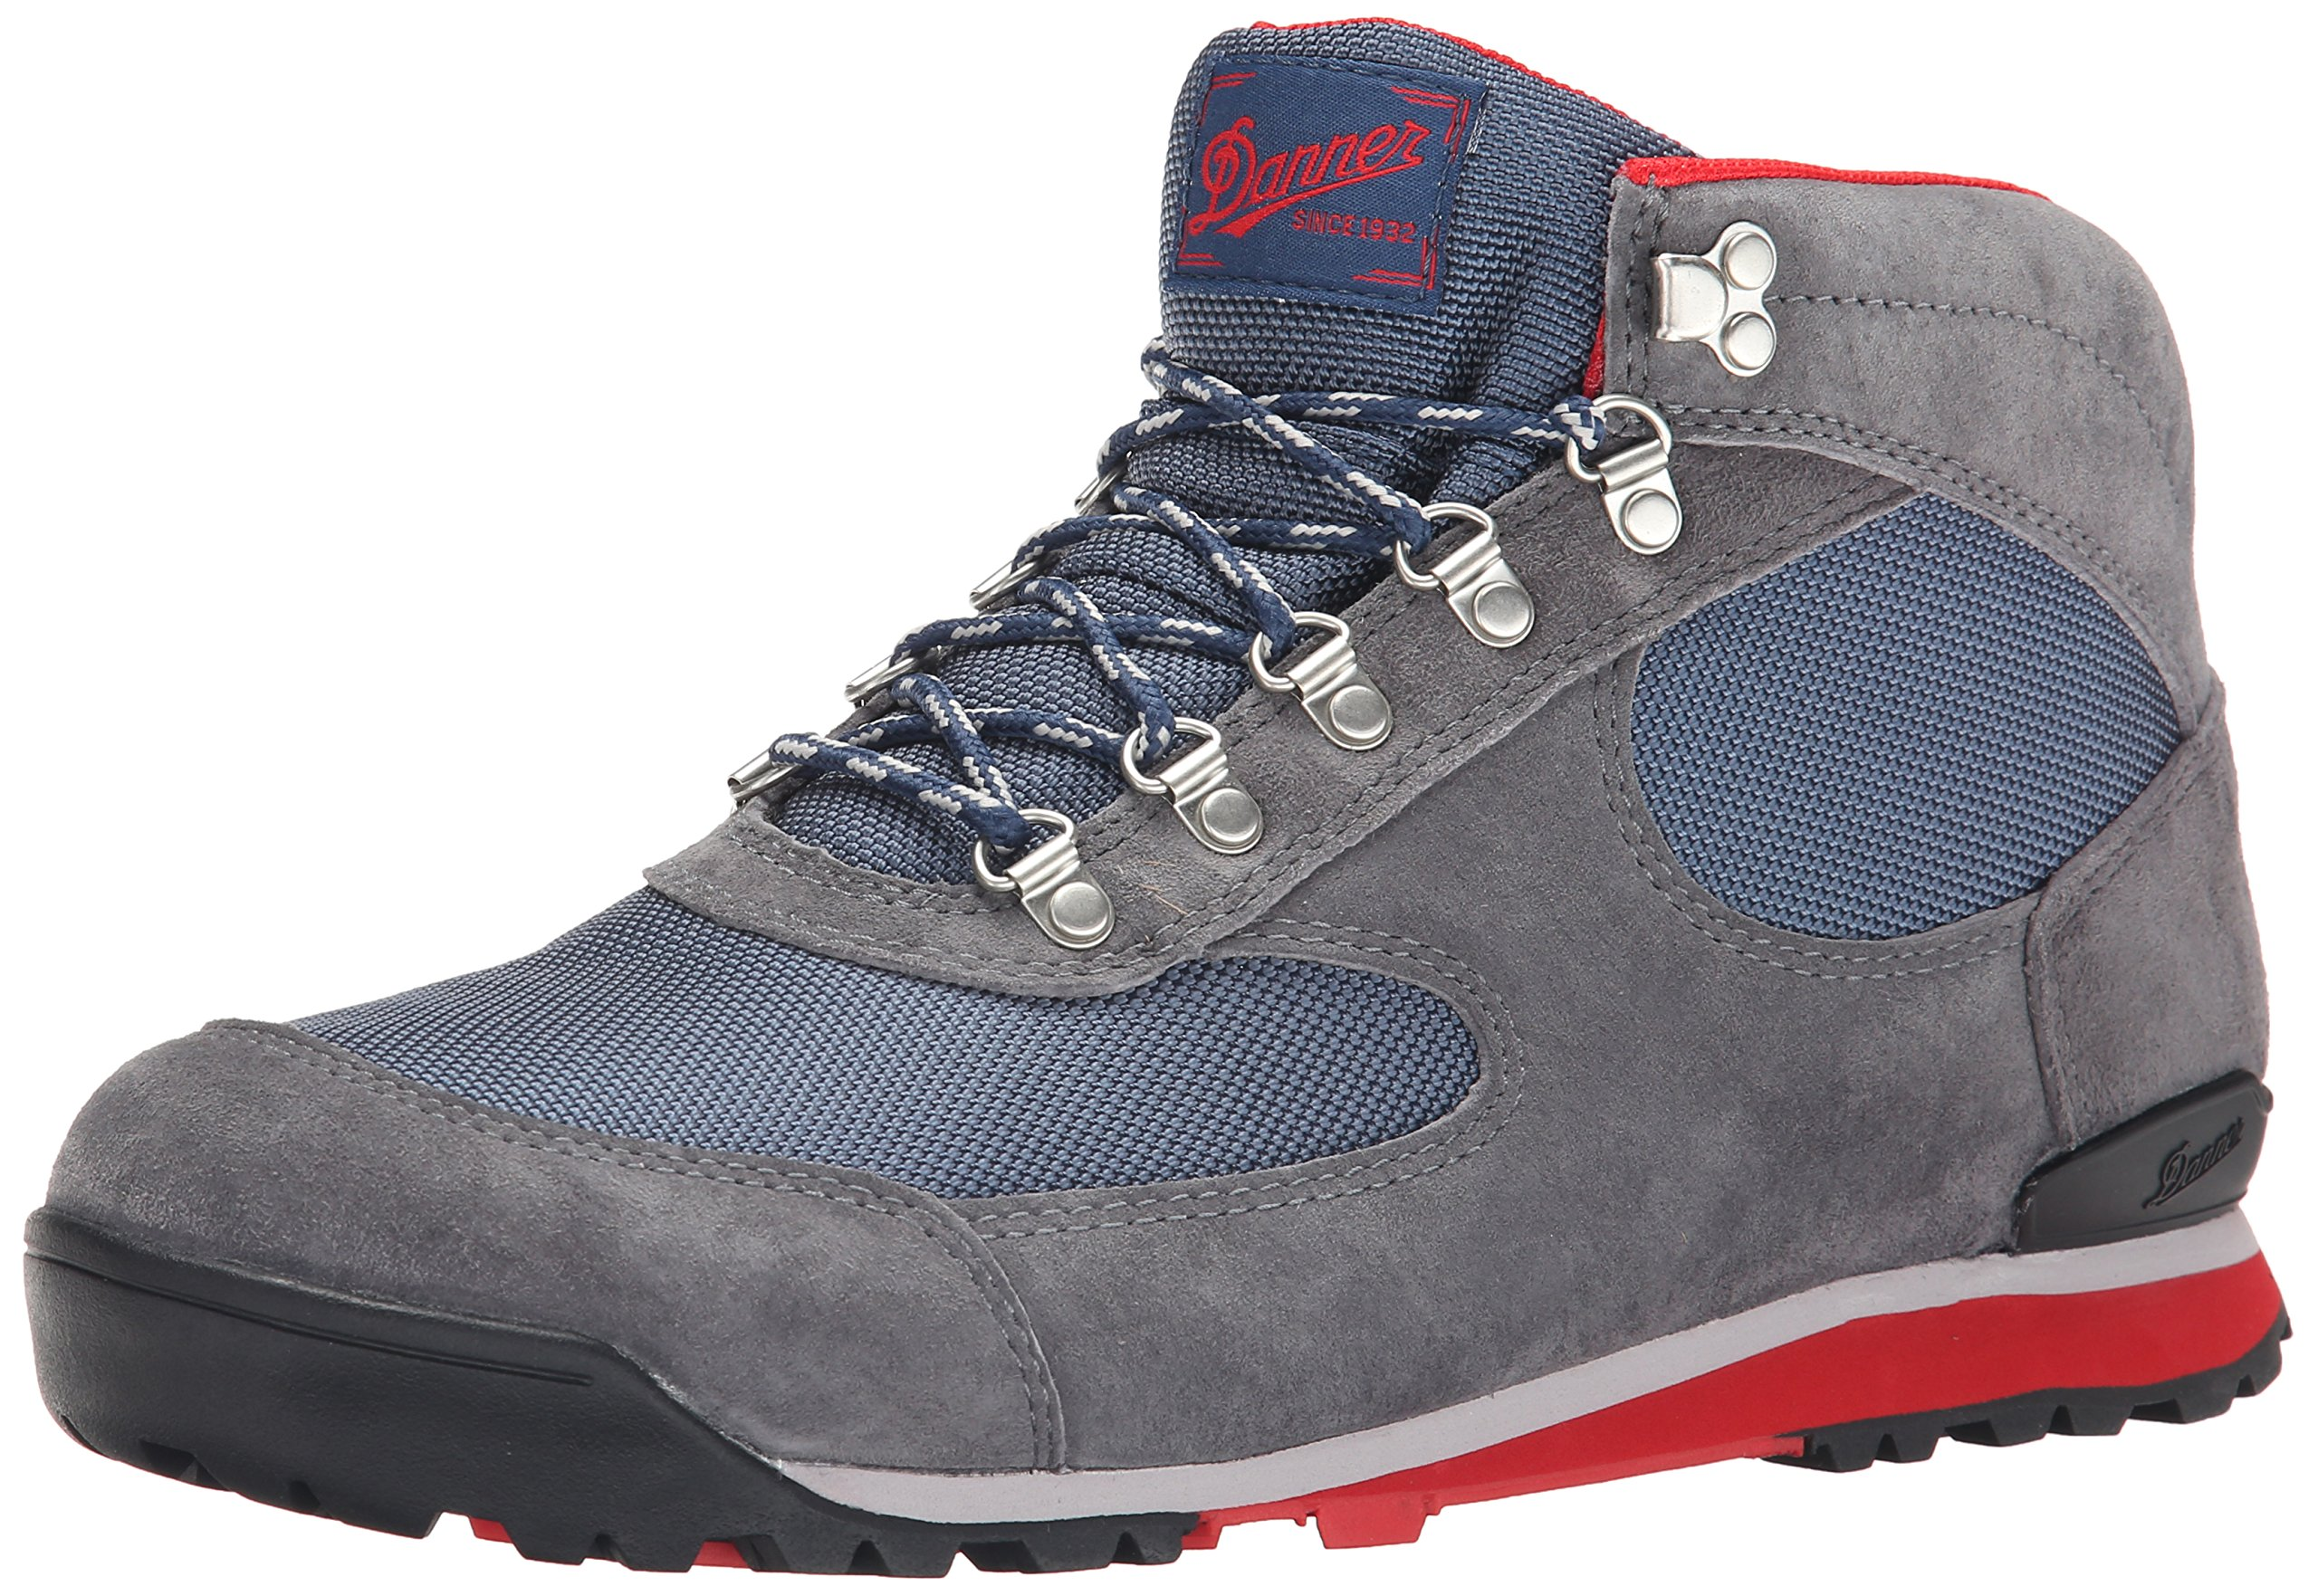 Danner Men's Jag Lifestyle Boot, Steel Gray/Blue Wing Teal, 11 D US